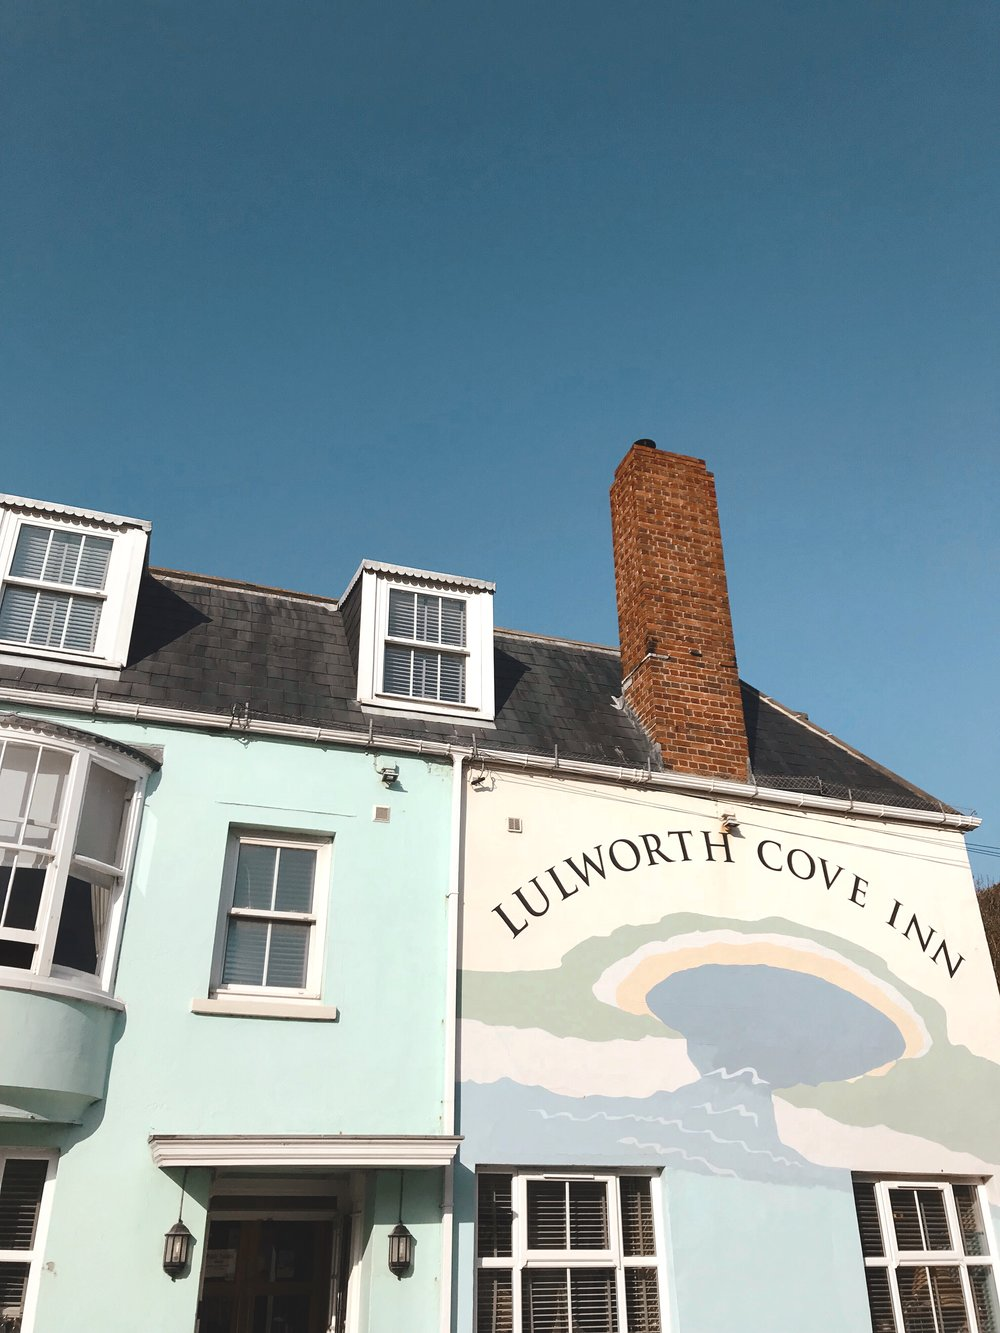 Visiting Lulworth Cove, Dorset